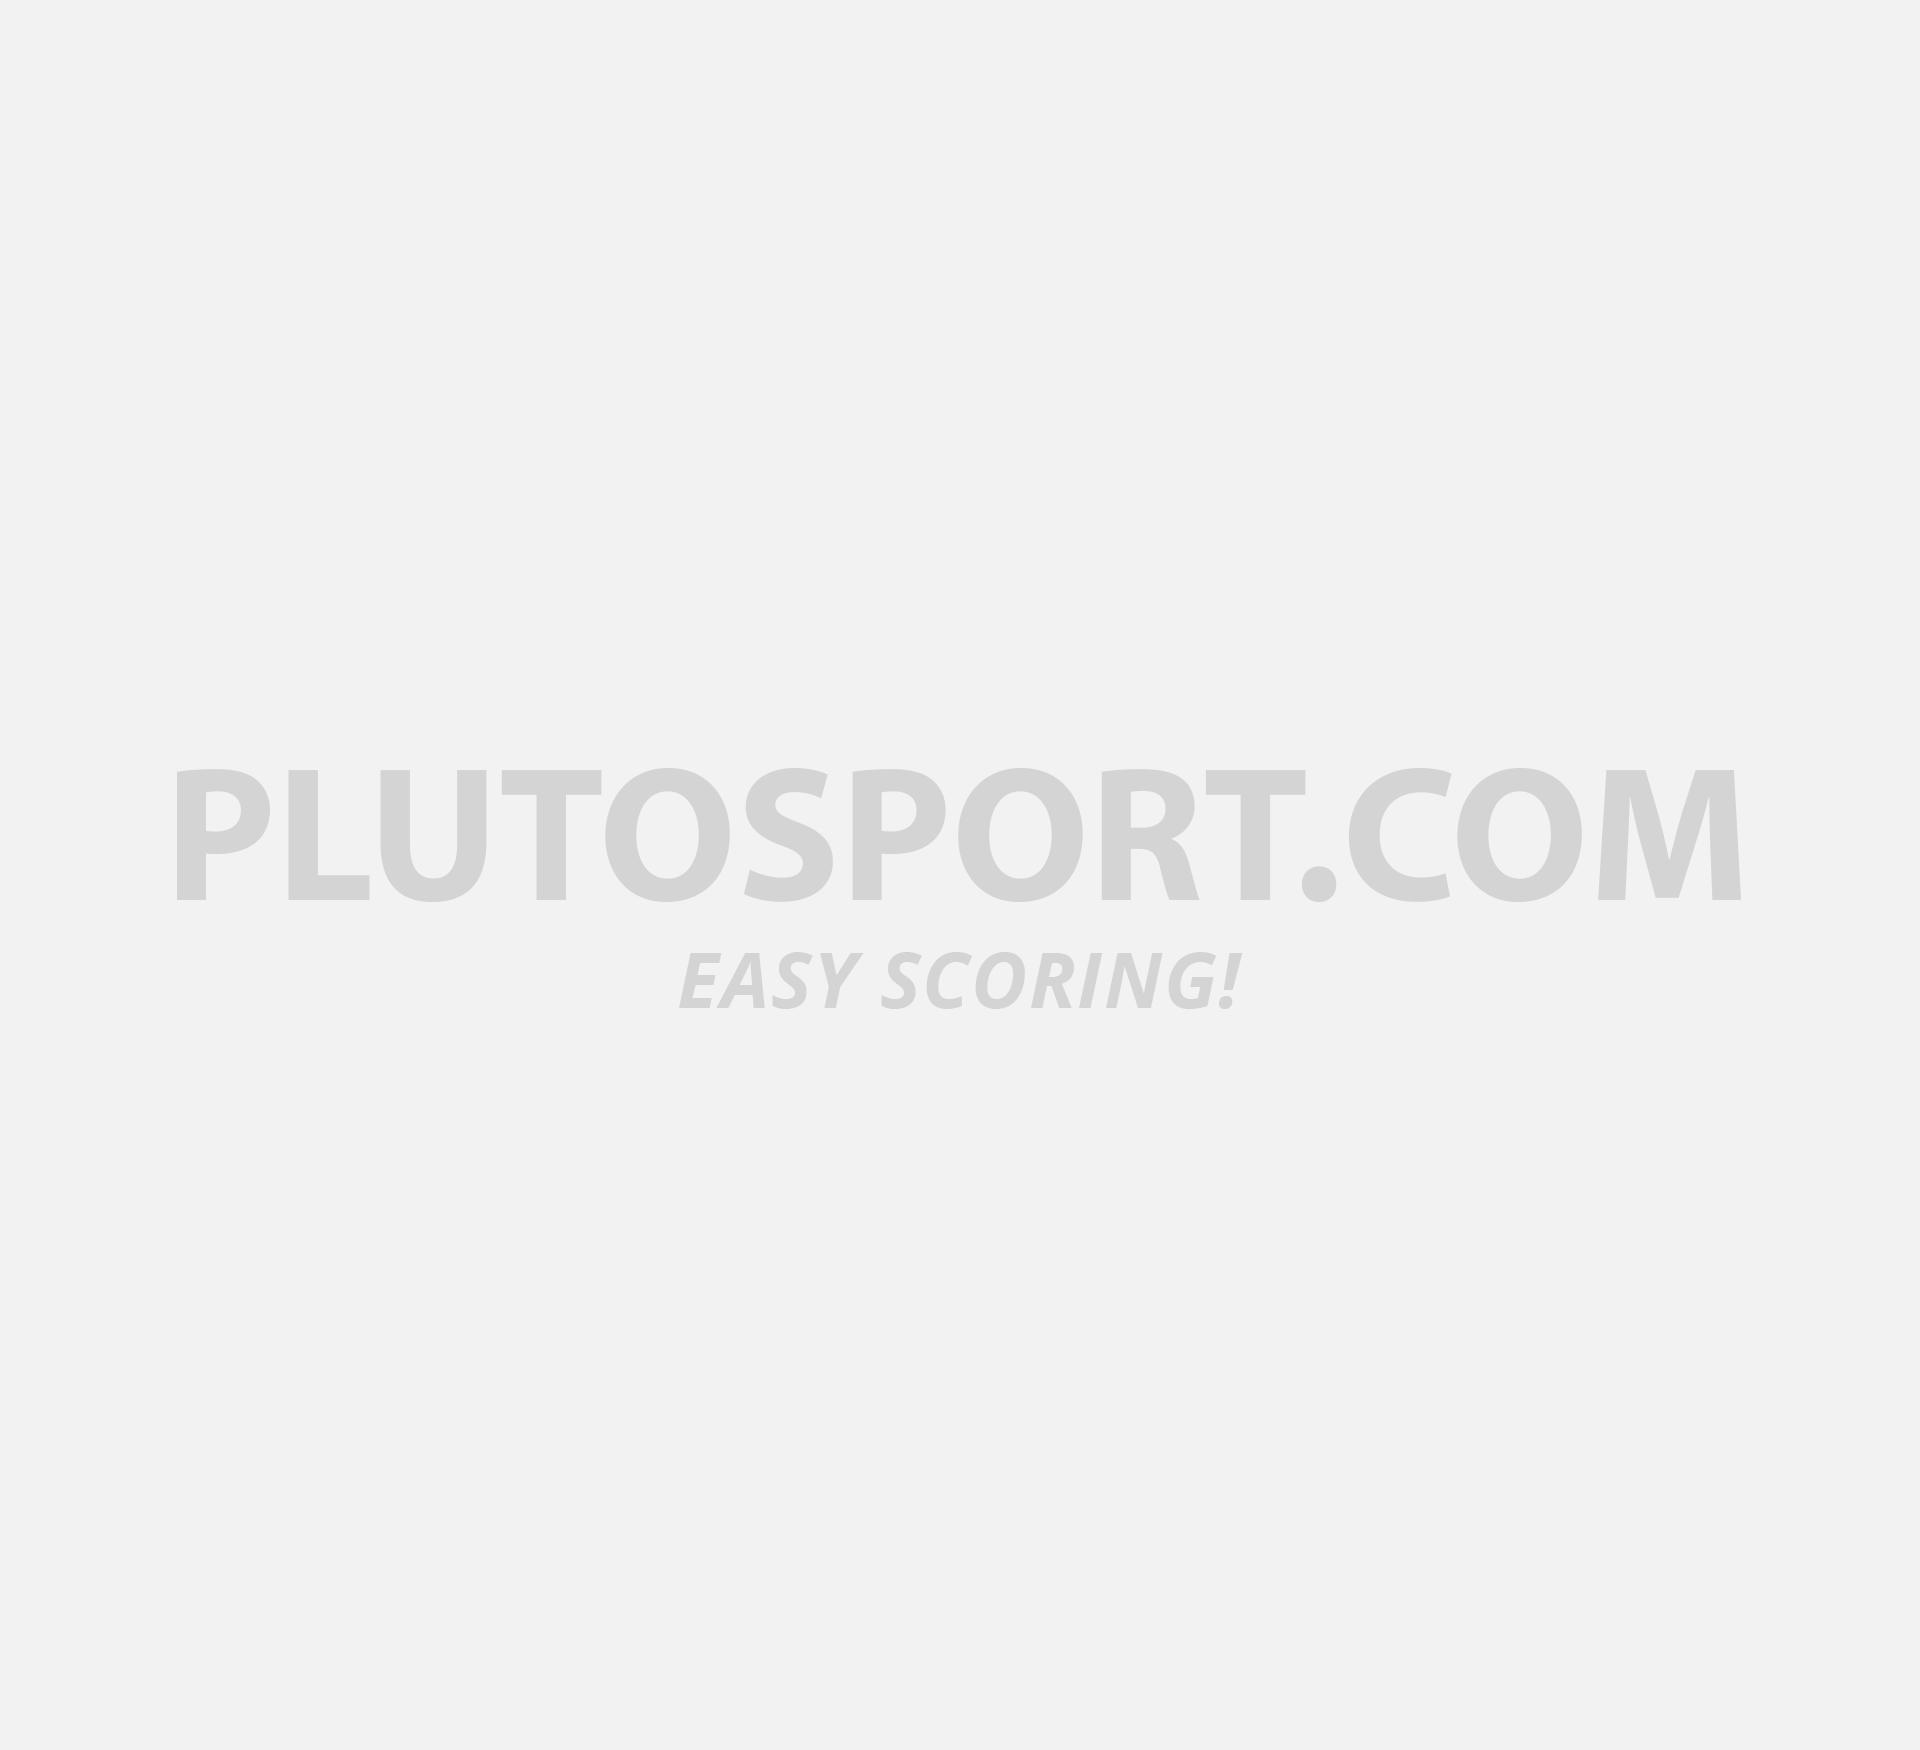 a123bcd3bab Adidas Barricade V Classic Tennis Shoes Women - Gravel - Shoes - Tennis -  Sports | Plutosport